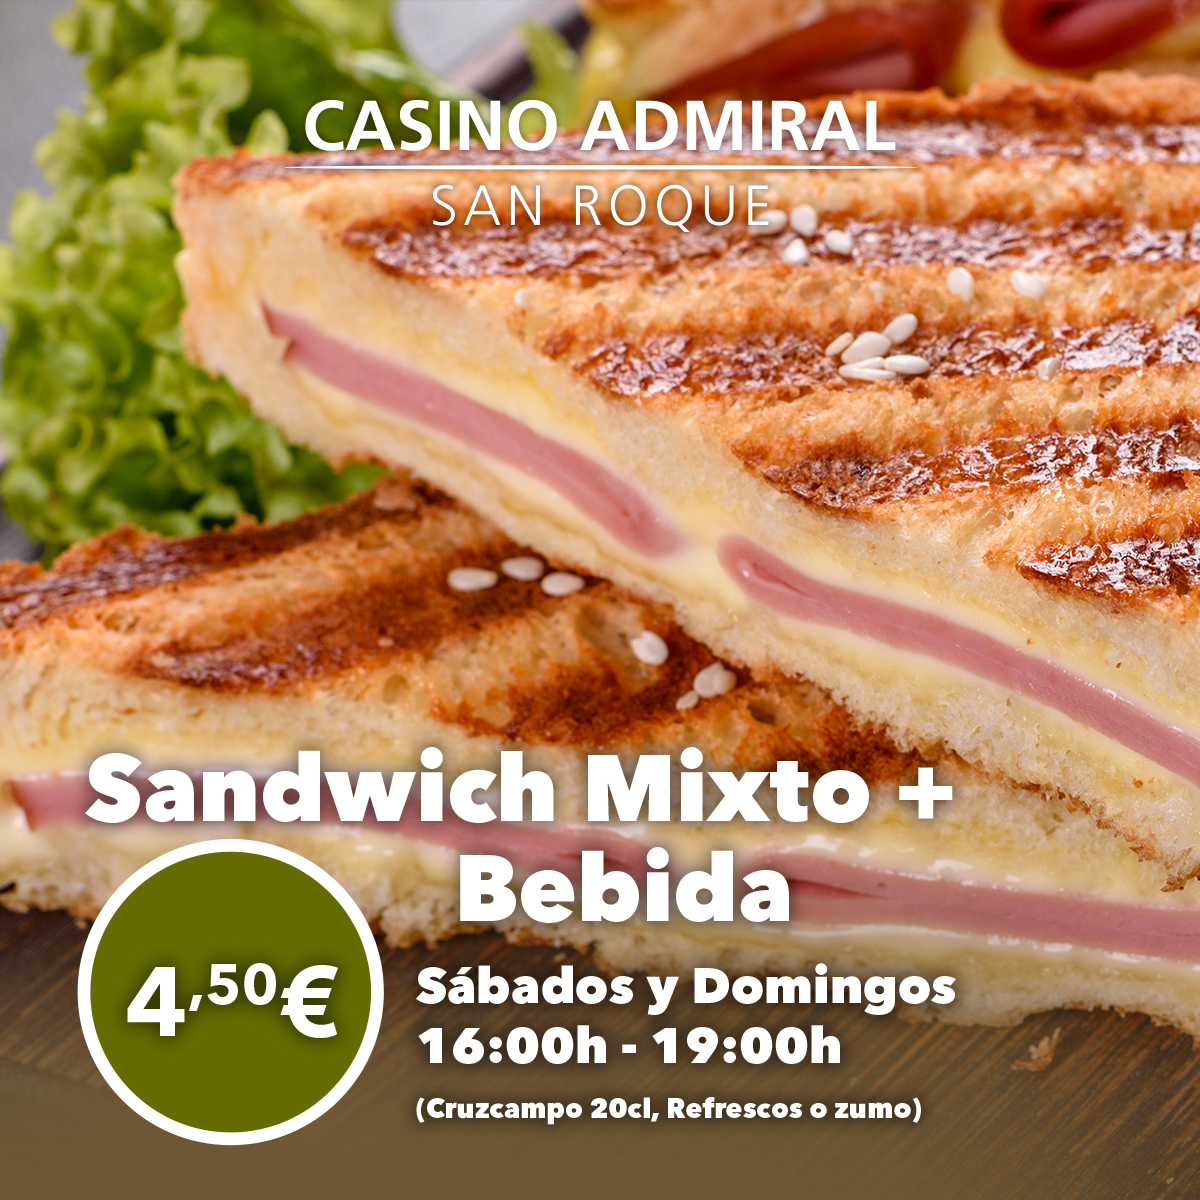 CA_SanRoque_Sandwich+Bebida